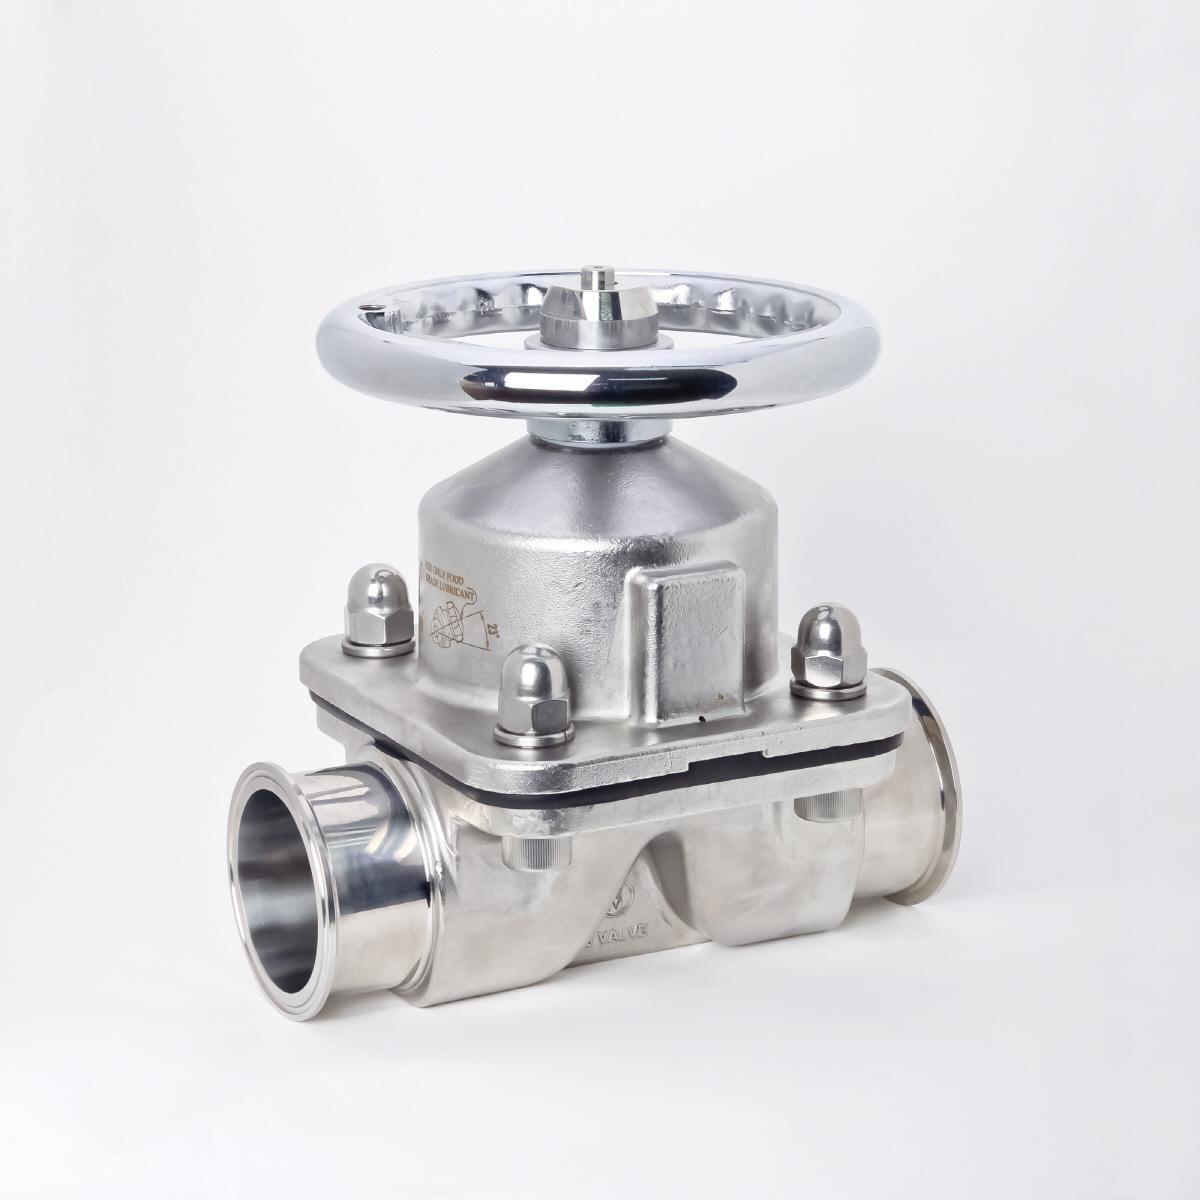 S-valve_0004.jpg